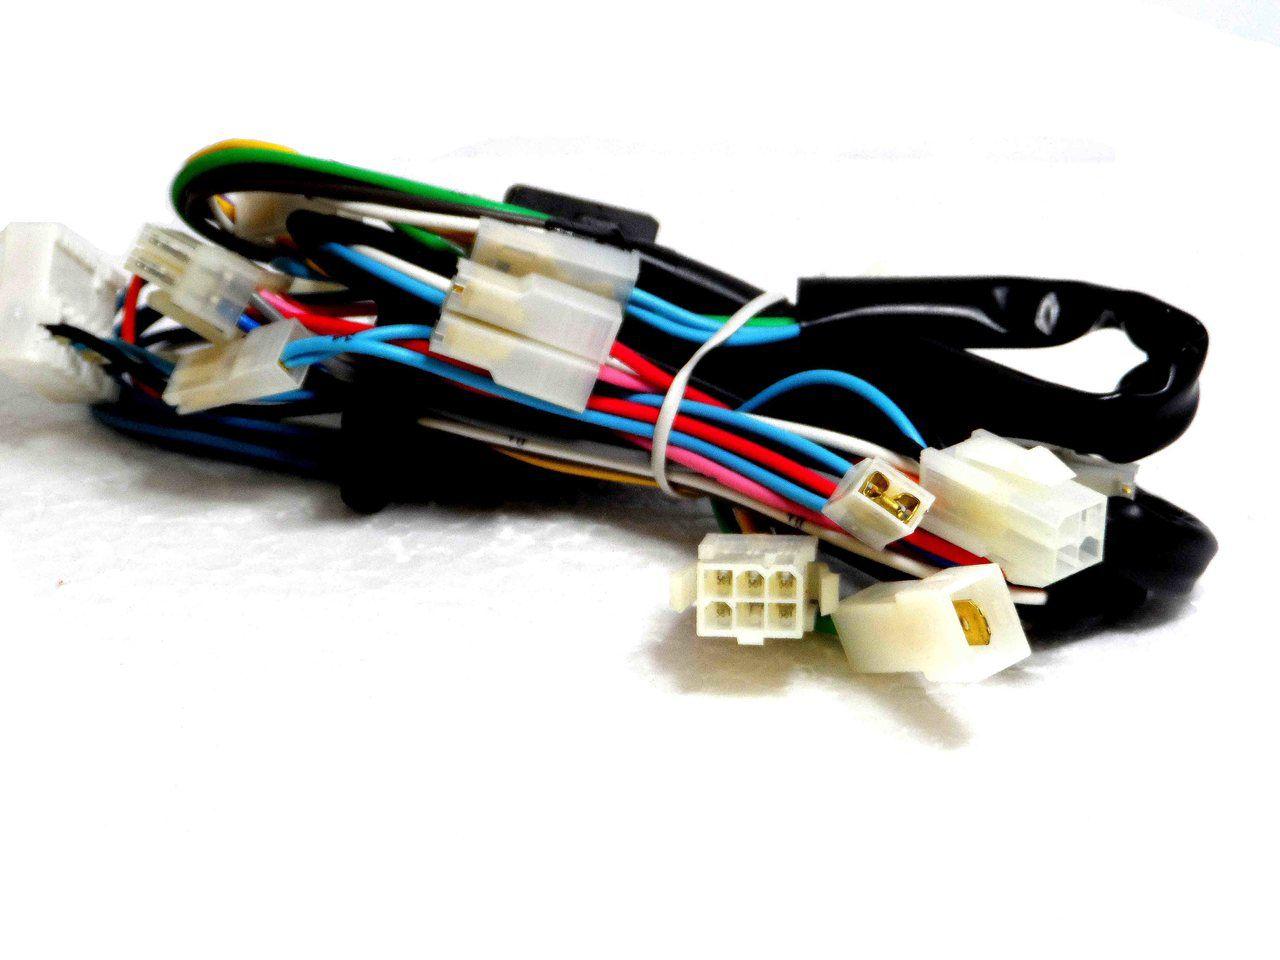 REDE ELÉTRICA SUPERIOR LAVADORA ELECTROLUX 64590722